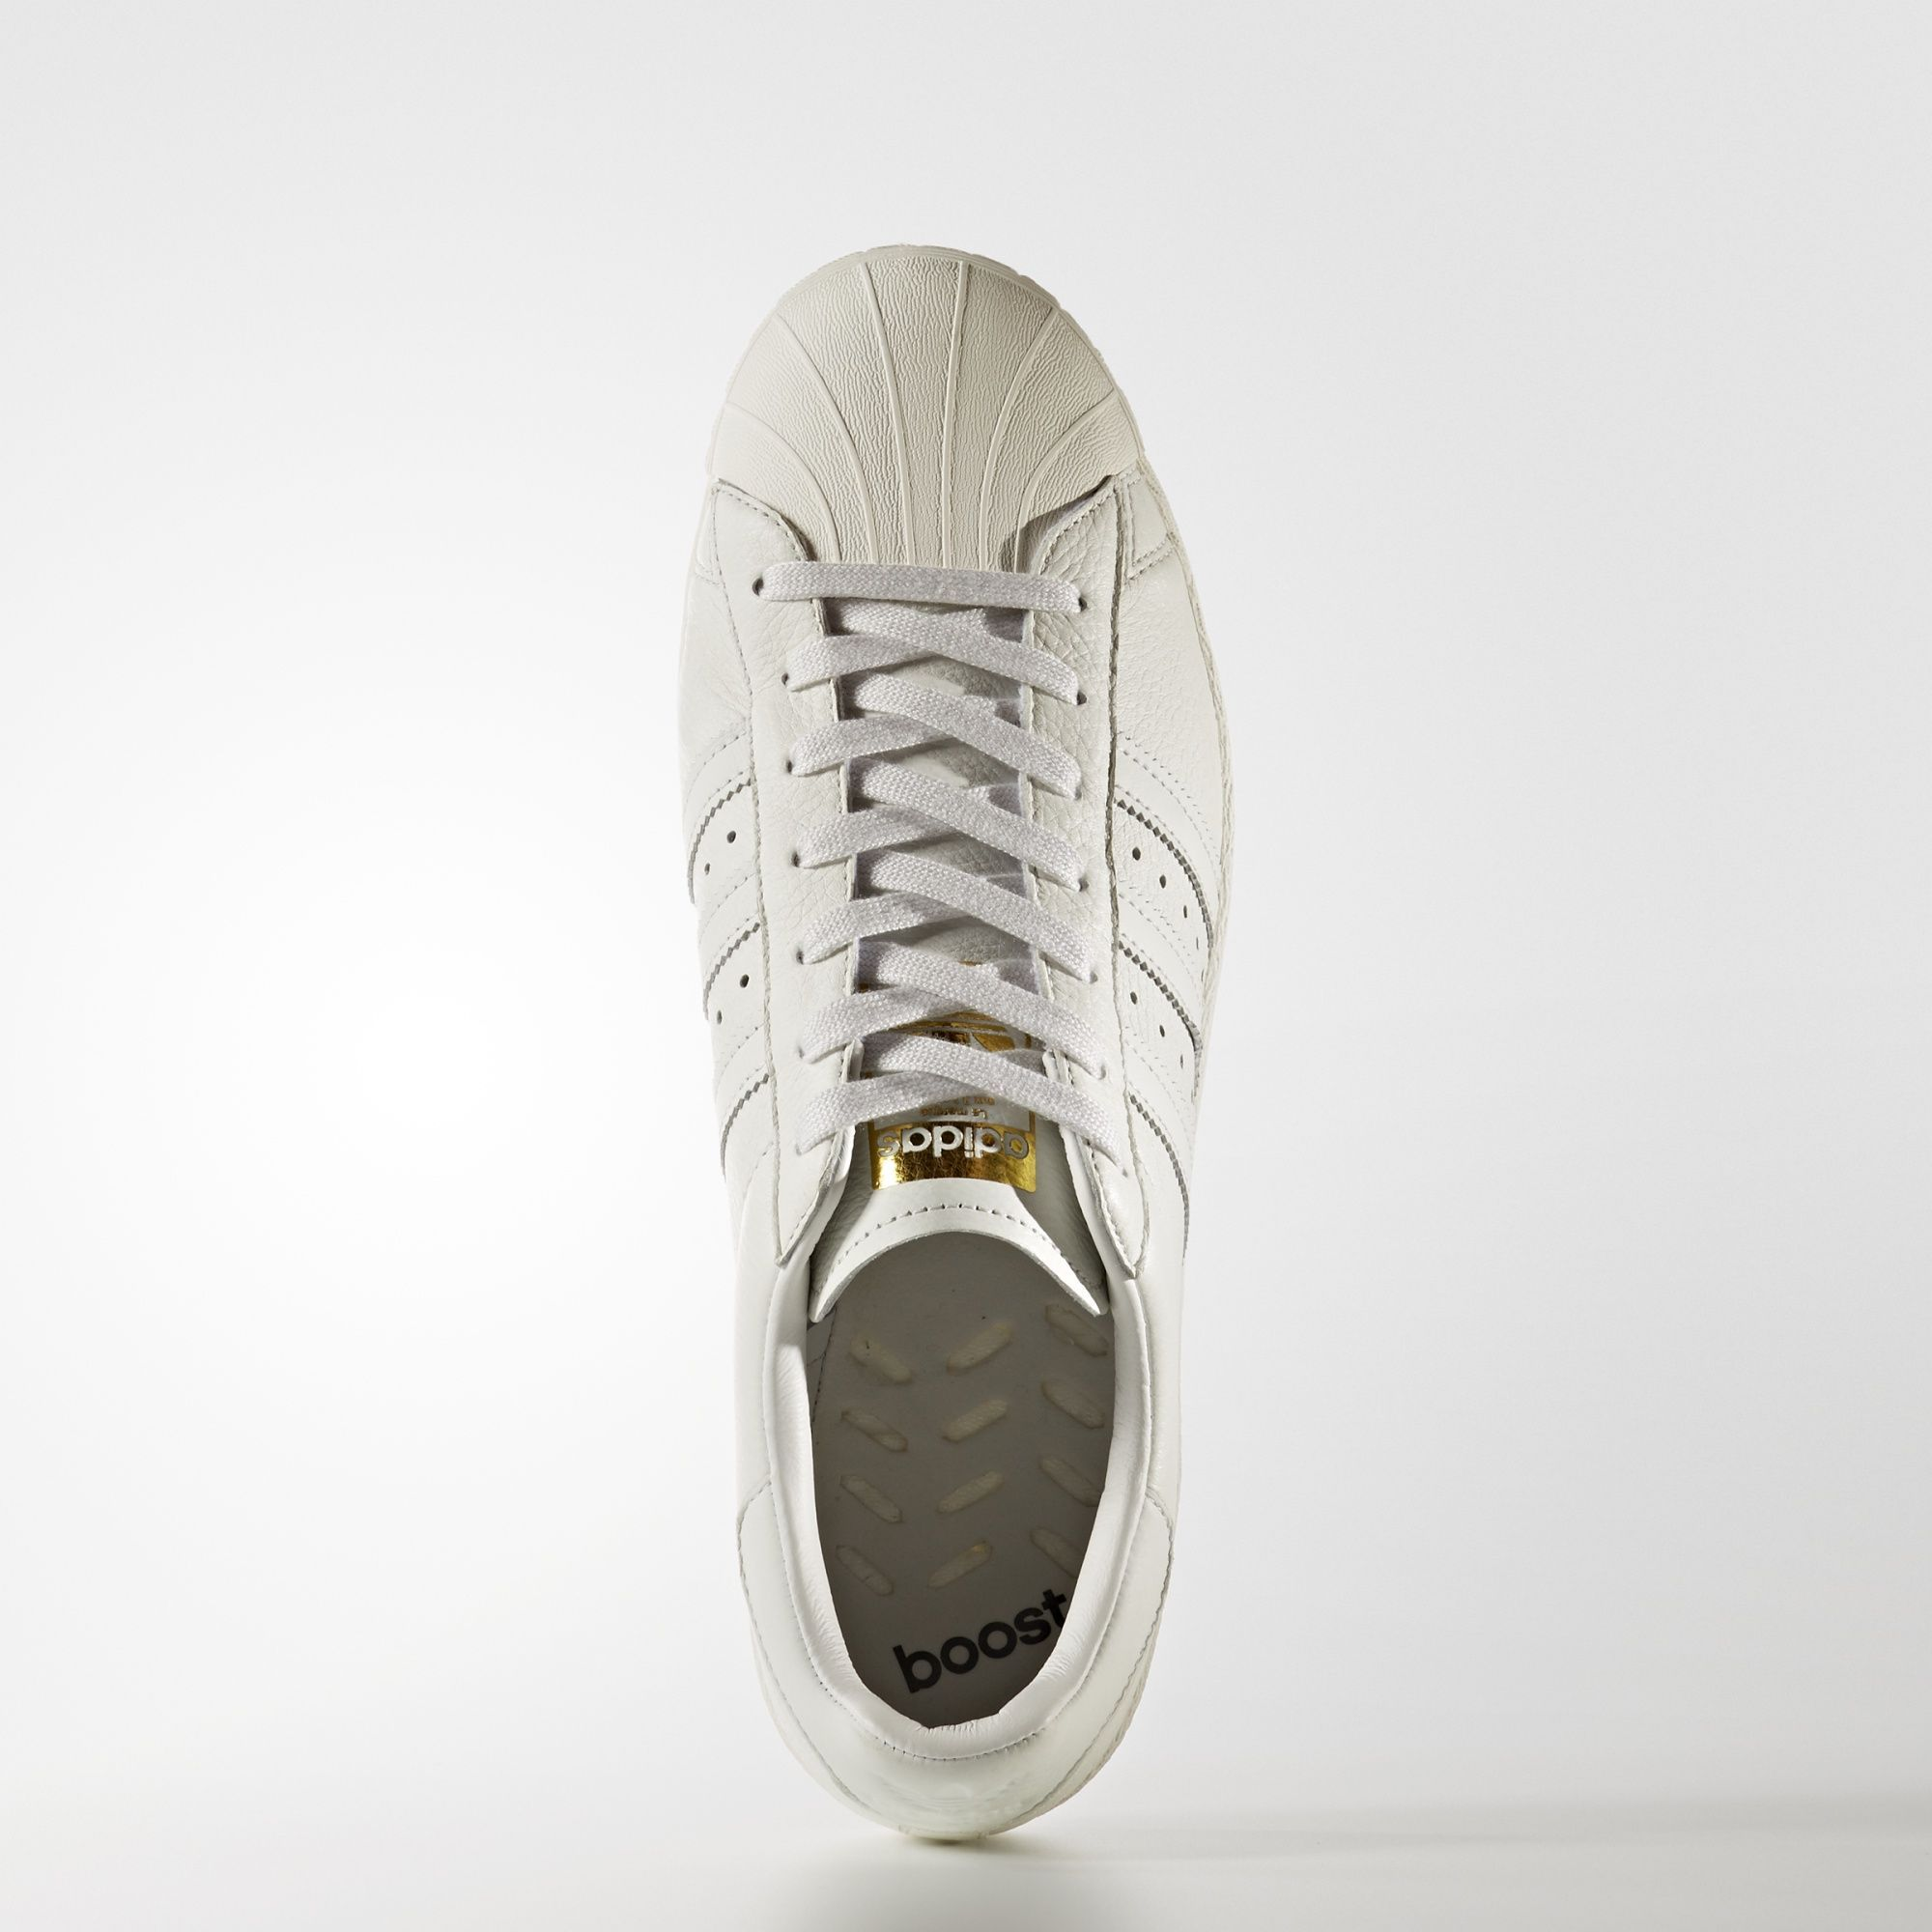 SchuhAdidas SuperstarAdidas Boost Superstar Superstar SchuhAdidas adidas adidas Boost WH9IDE2